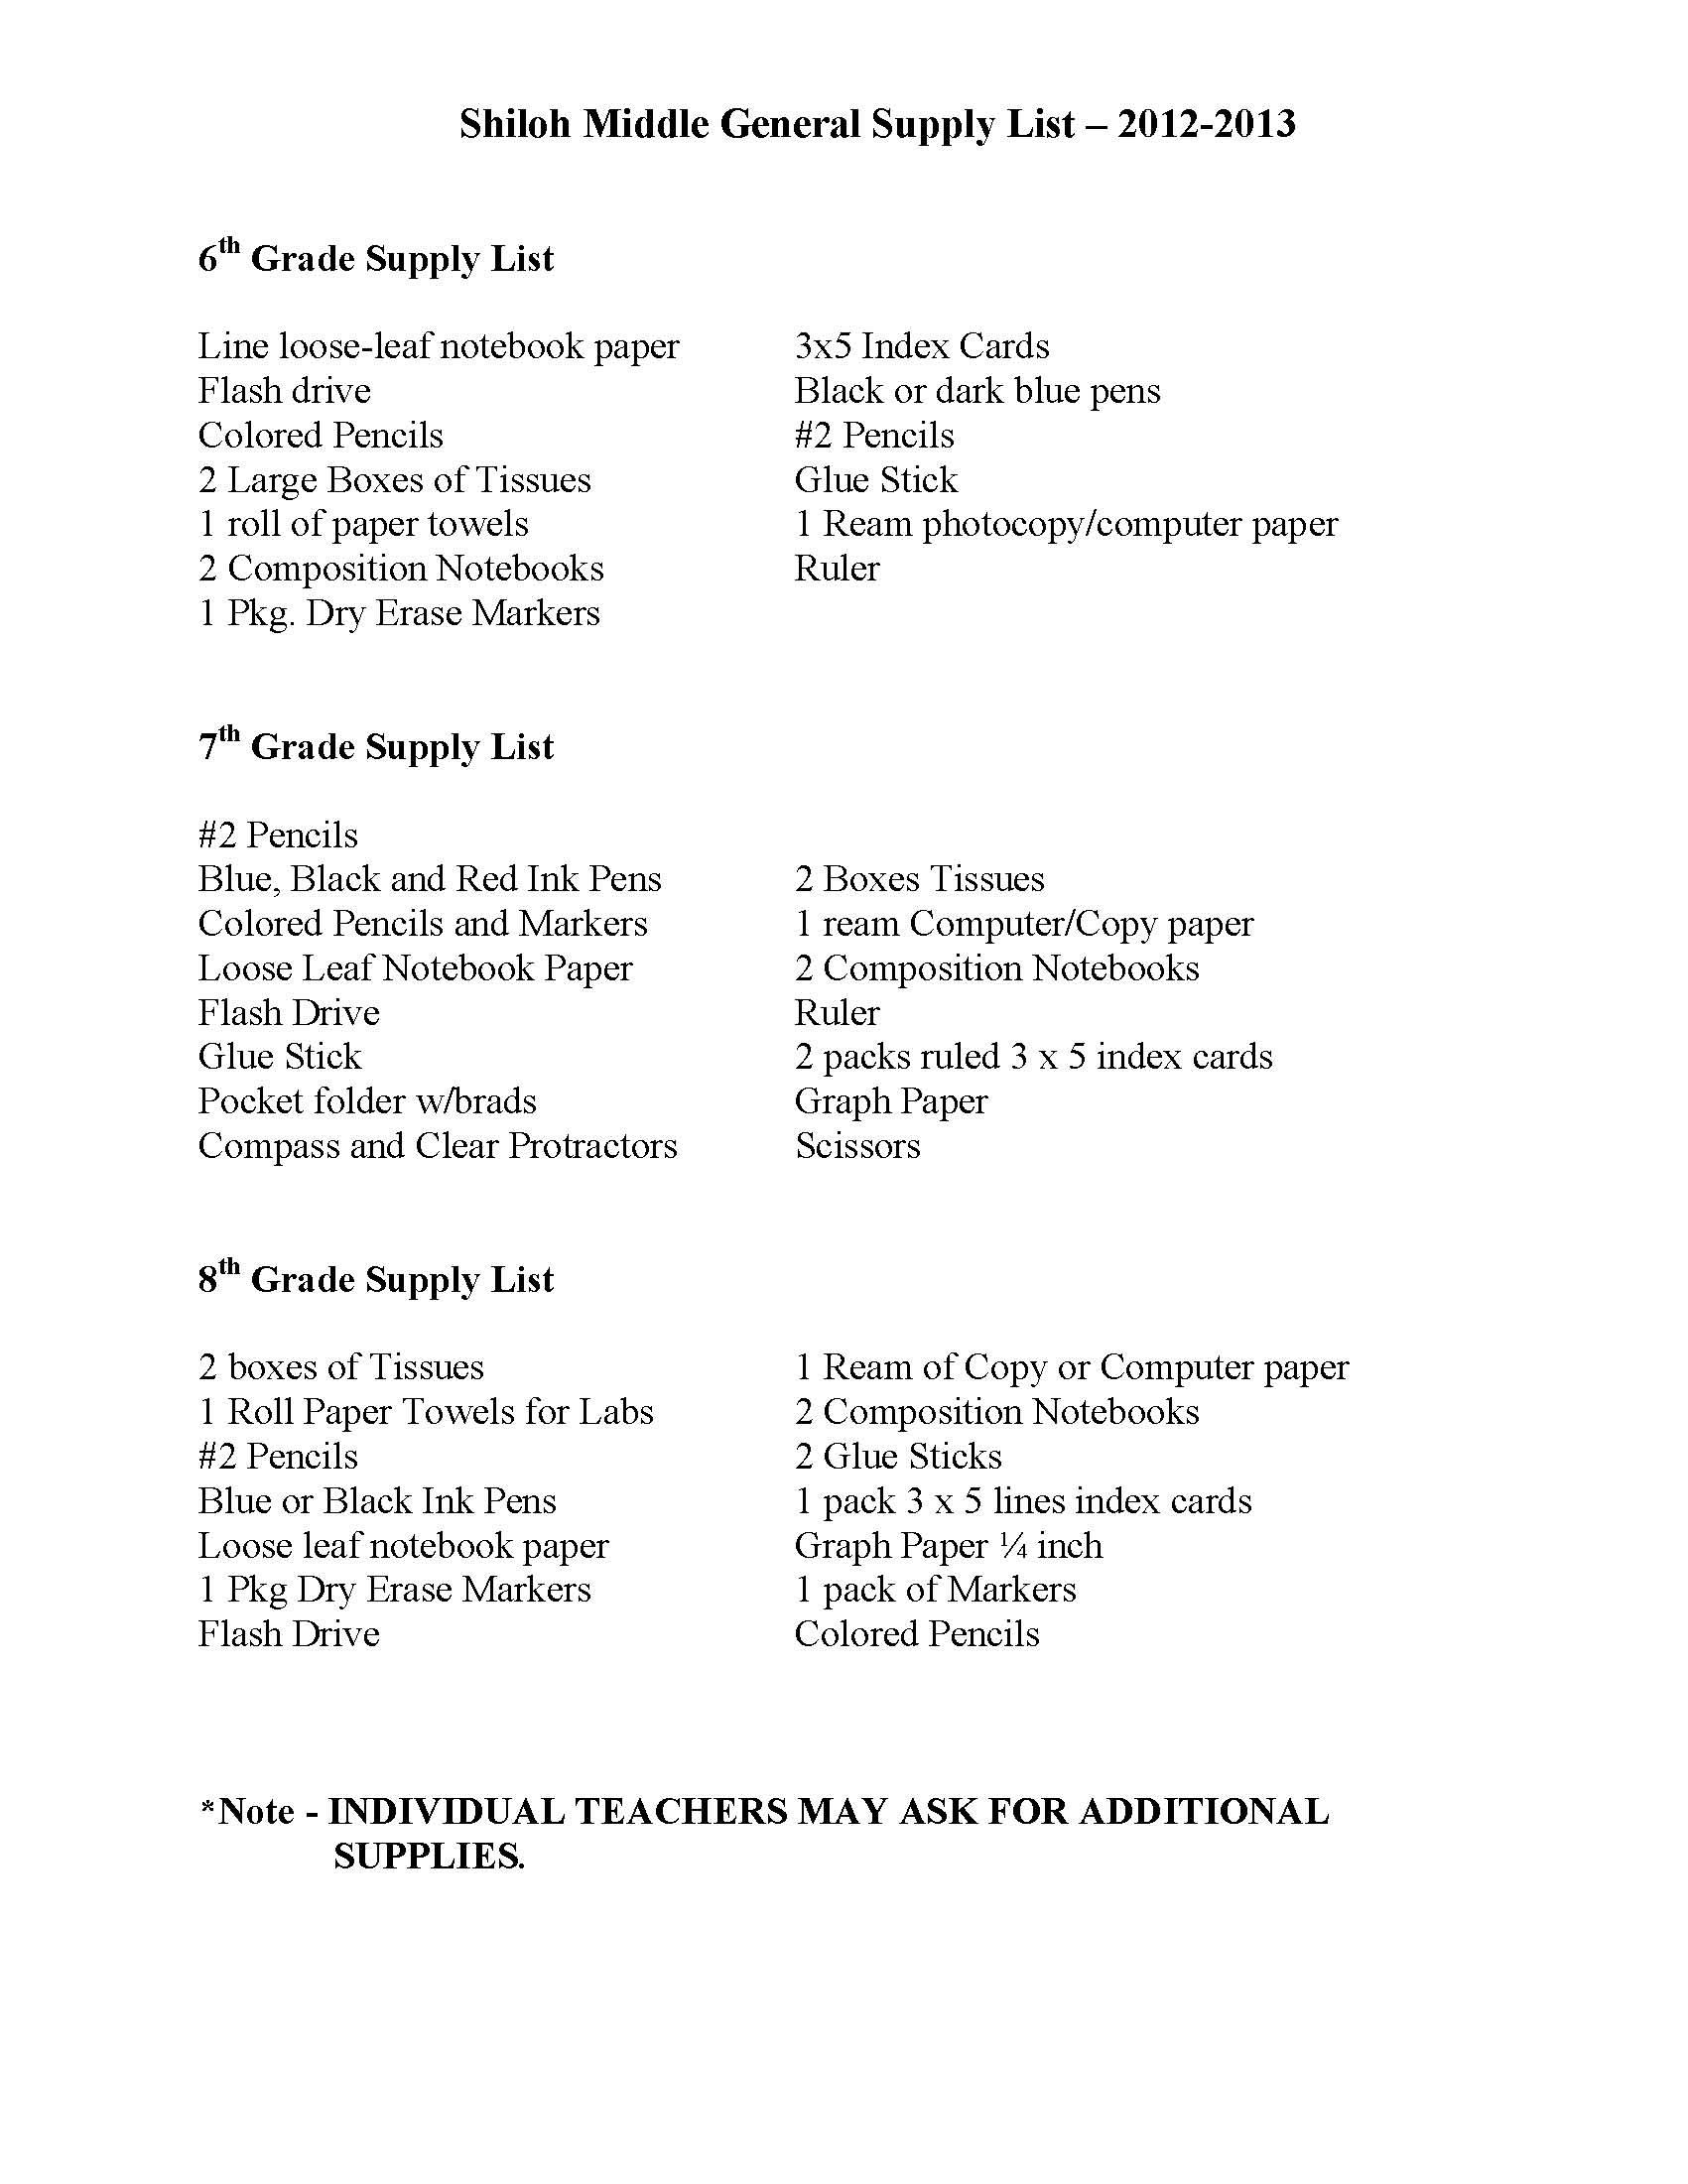 2012-2013 SMS Supply List